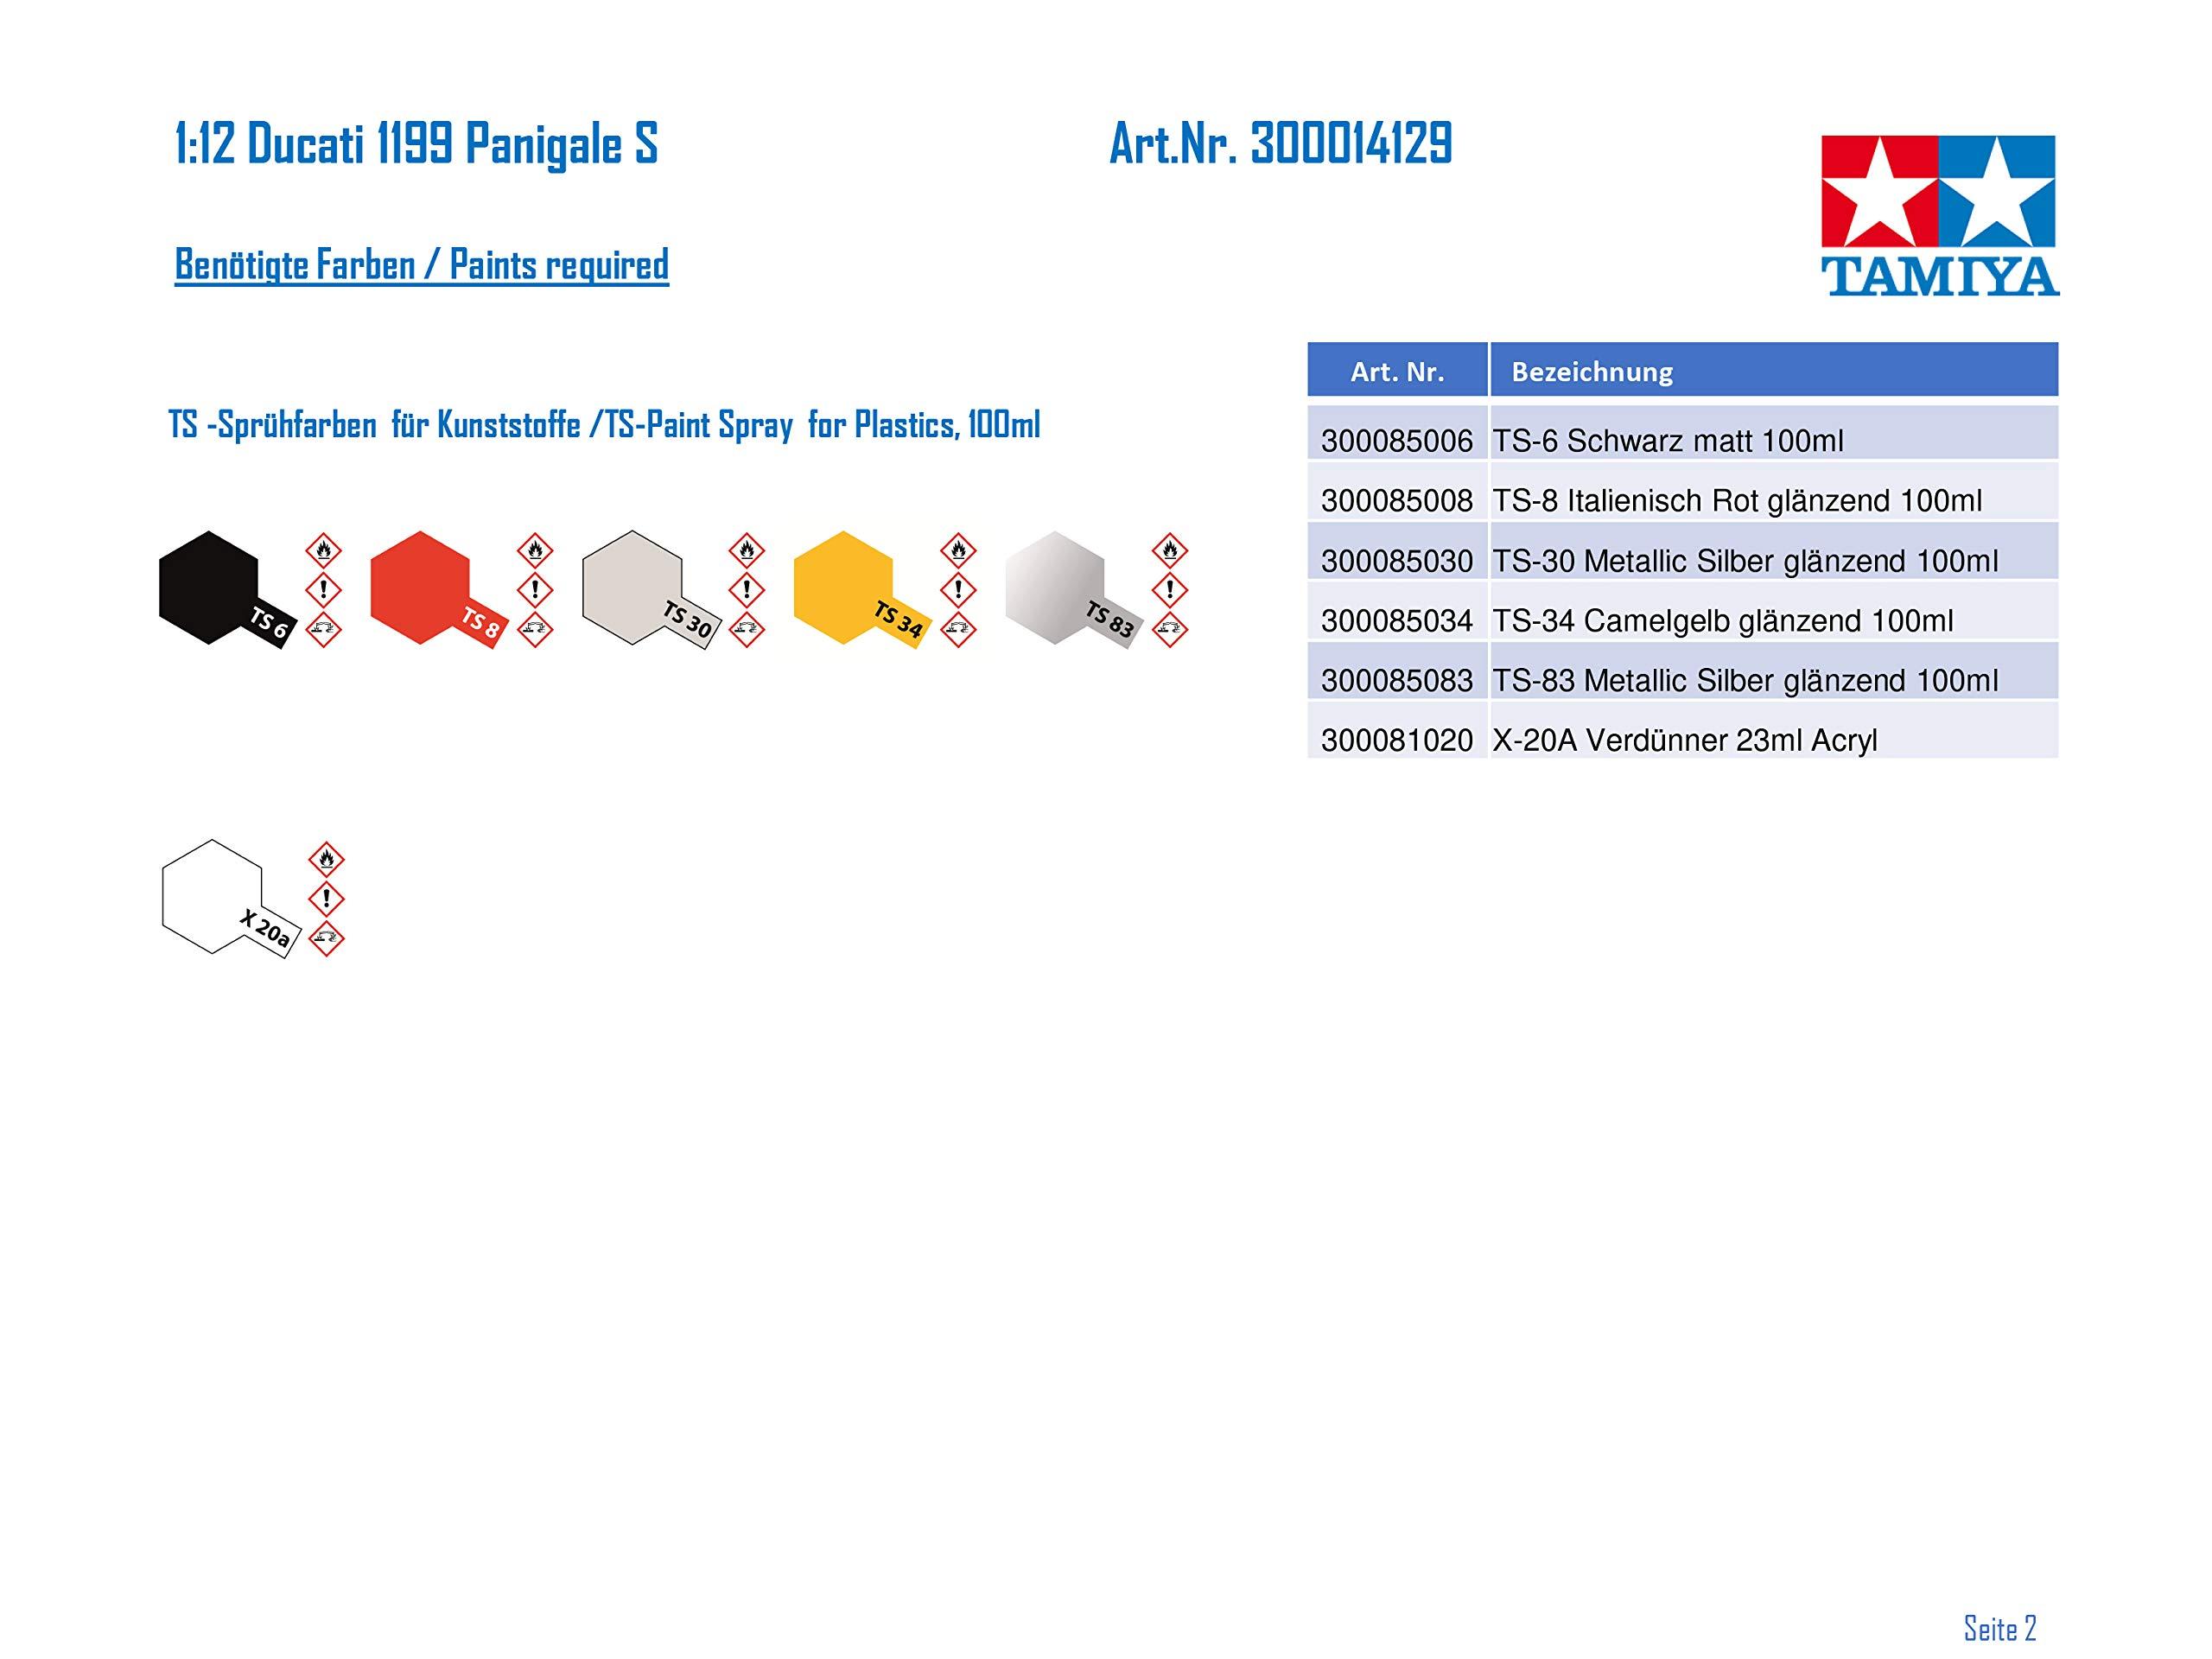 Tamiya 14129 1:12 Ducati 1199 Panigale S Model 4